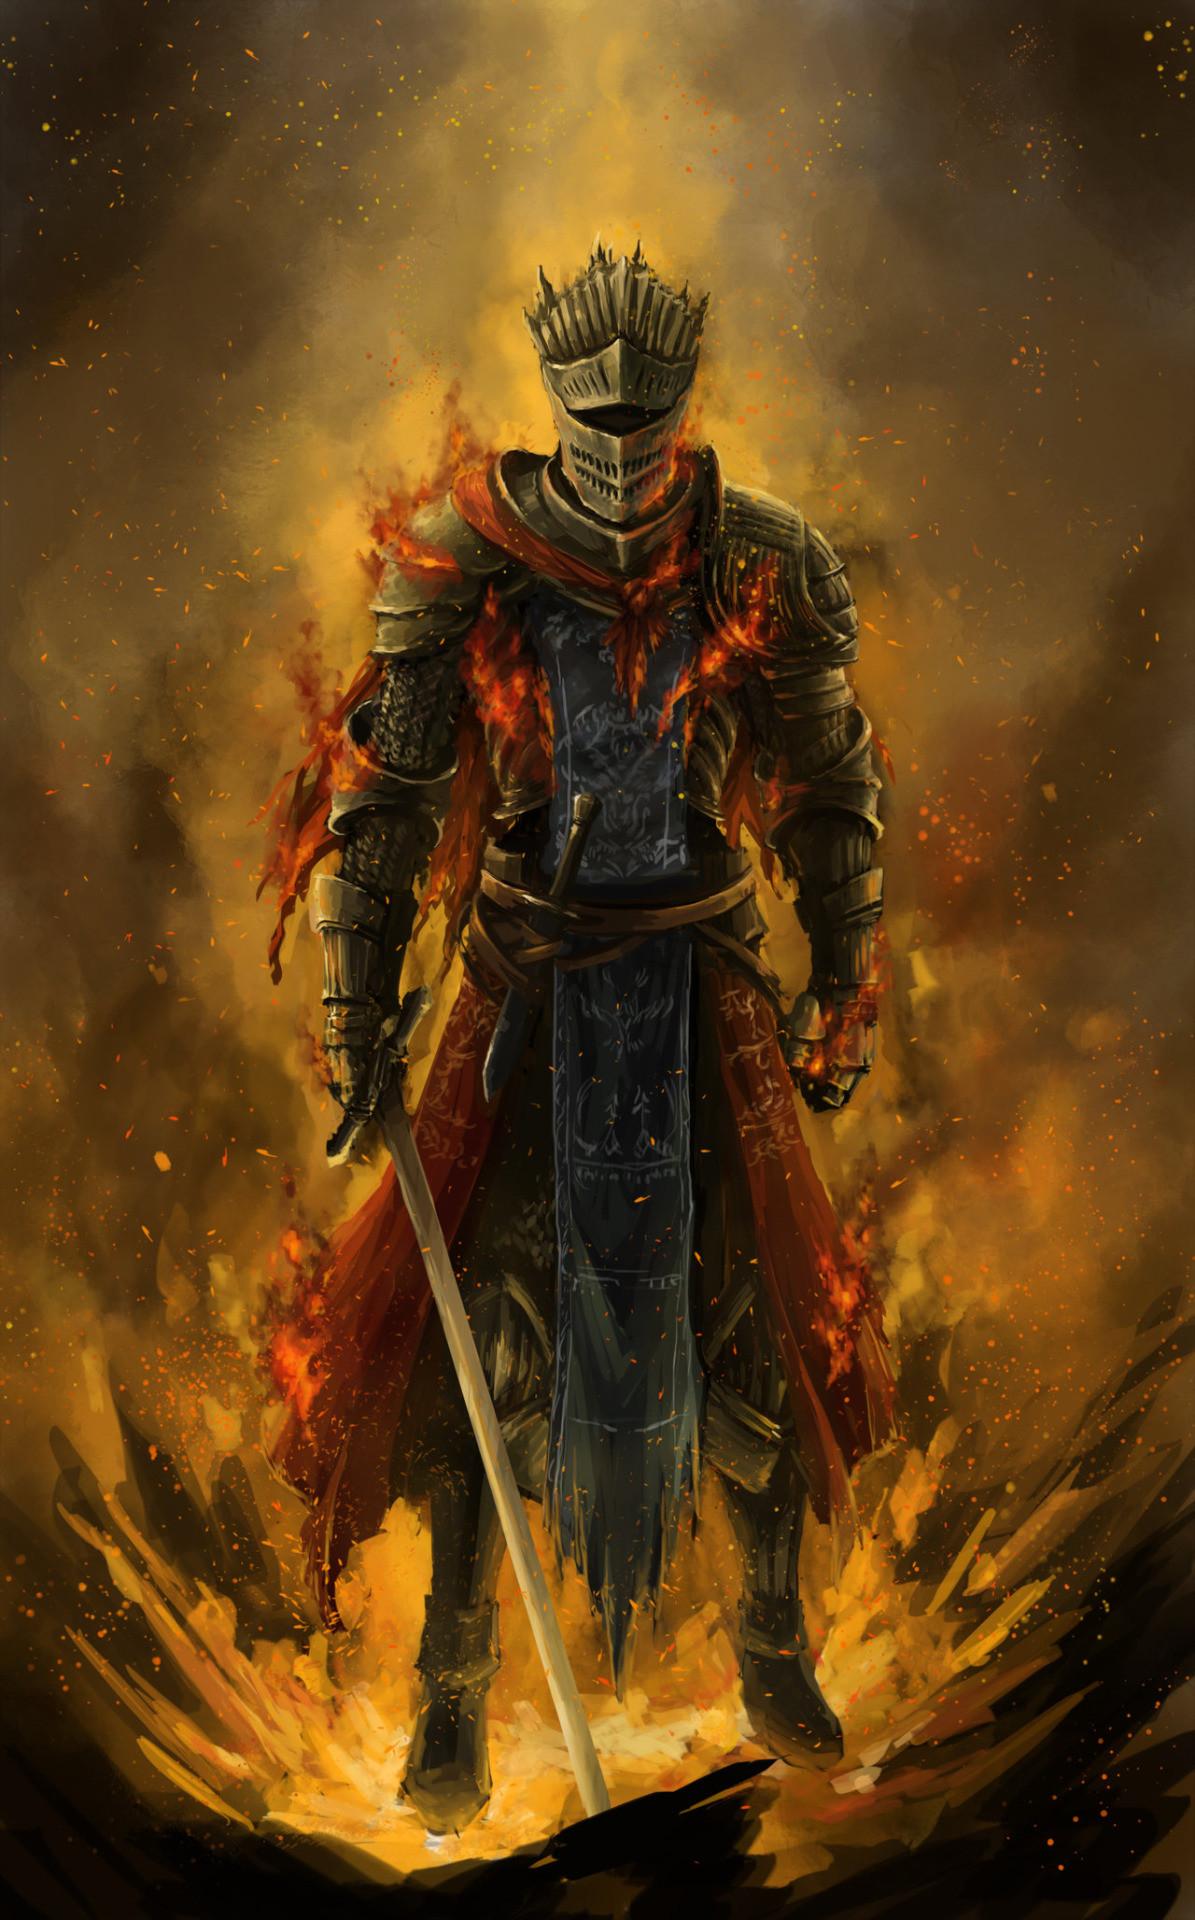 Dark Souls 3 Animated Wallpaper (81+ images)